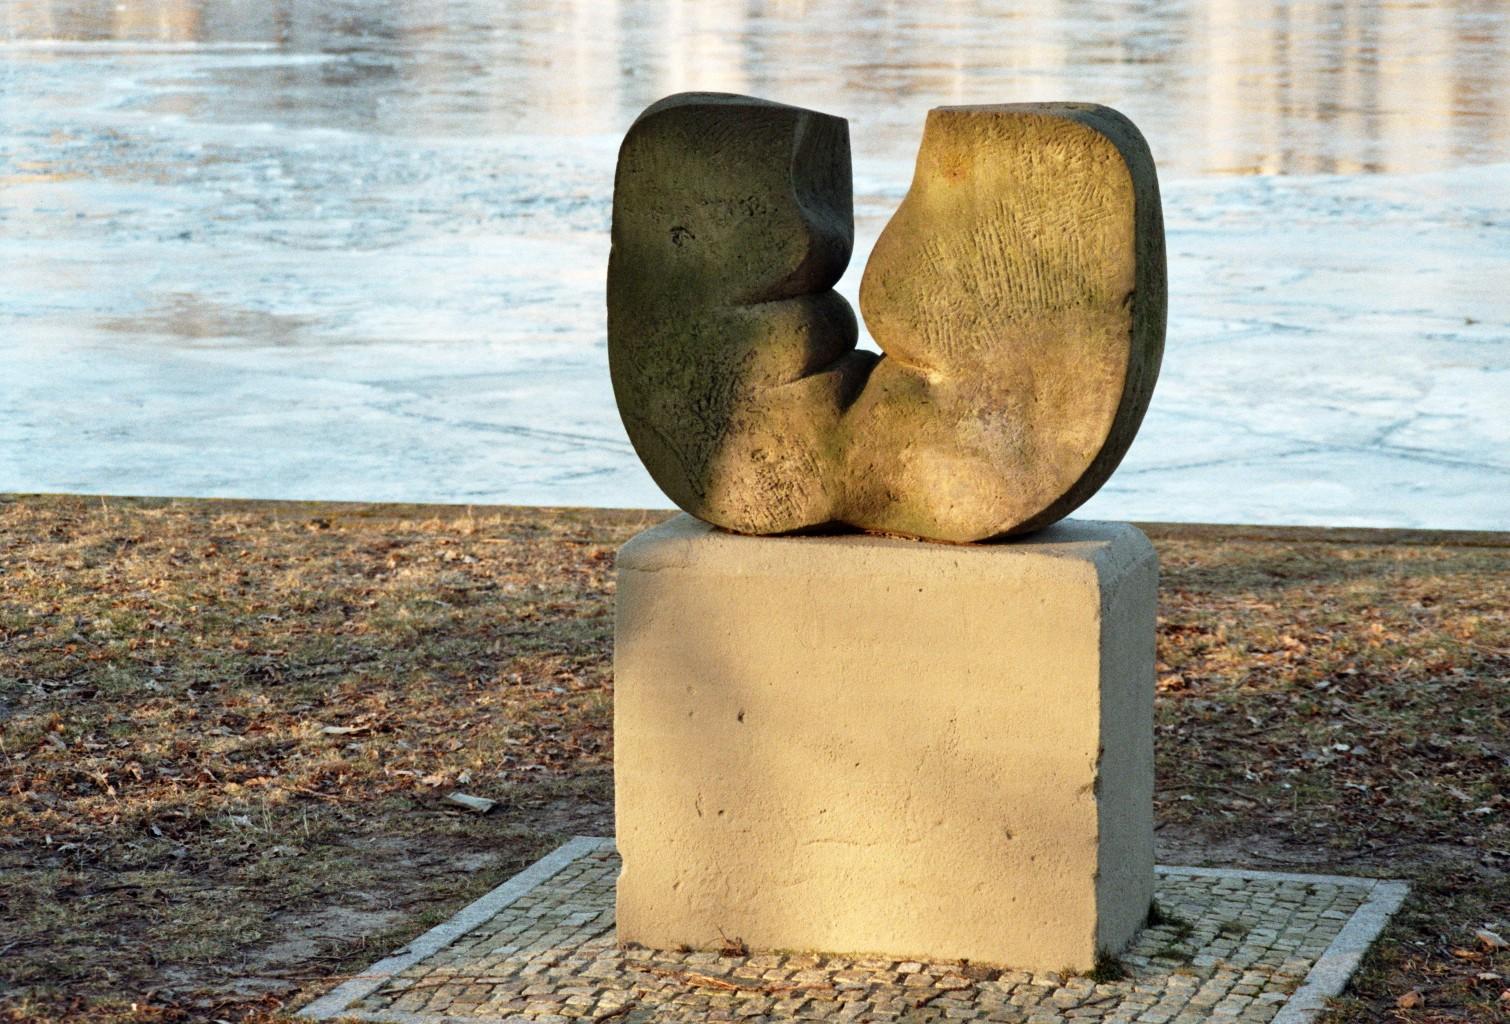 Kunst and der Spree